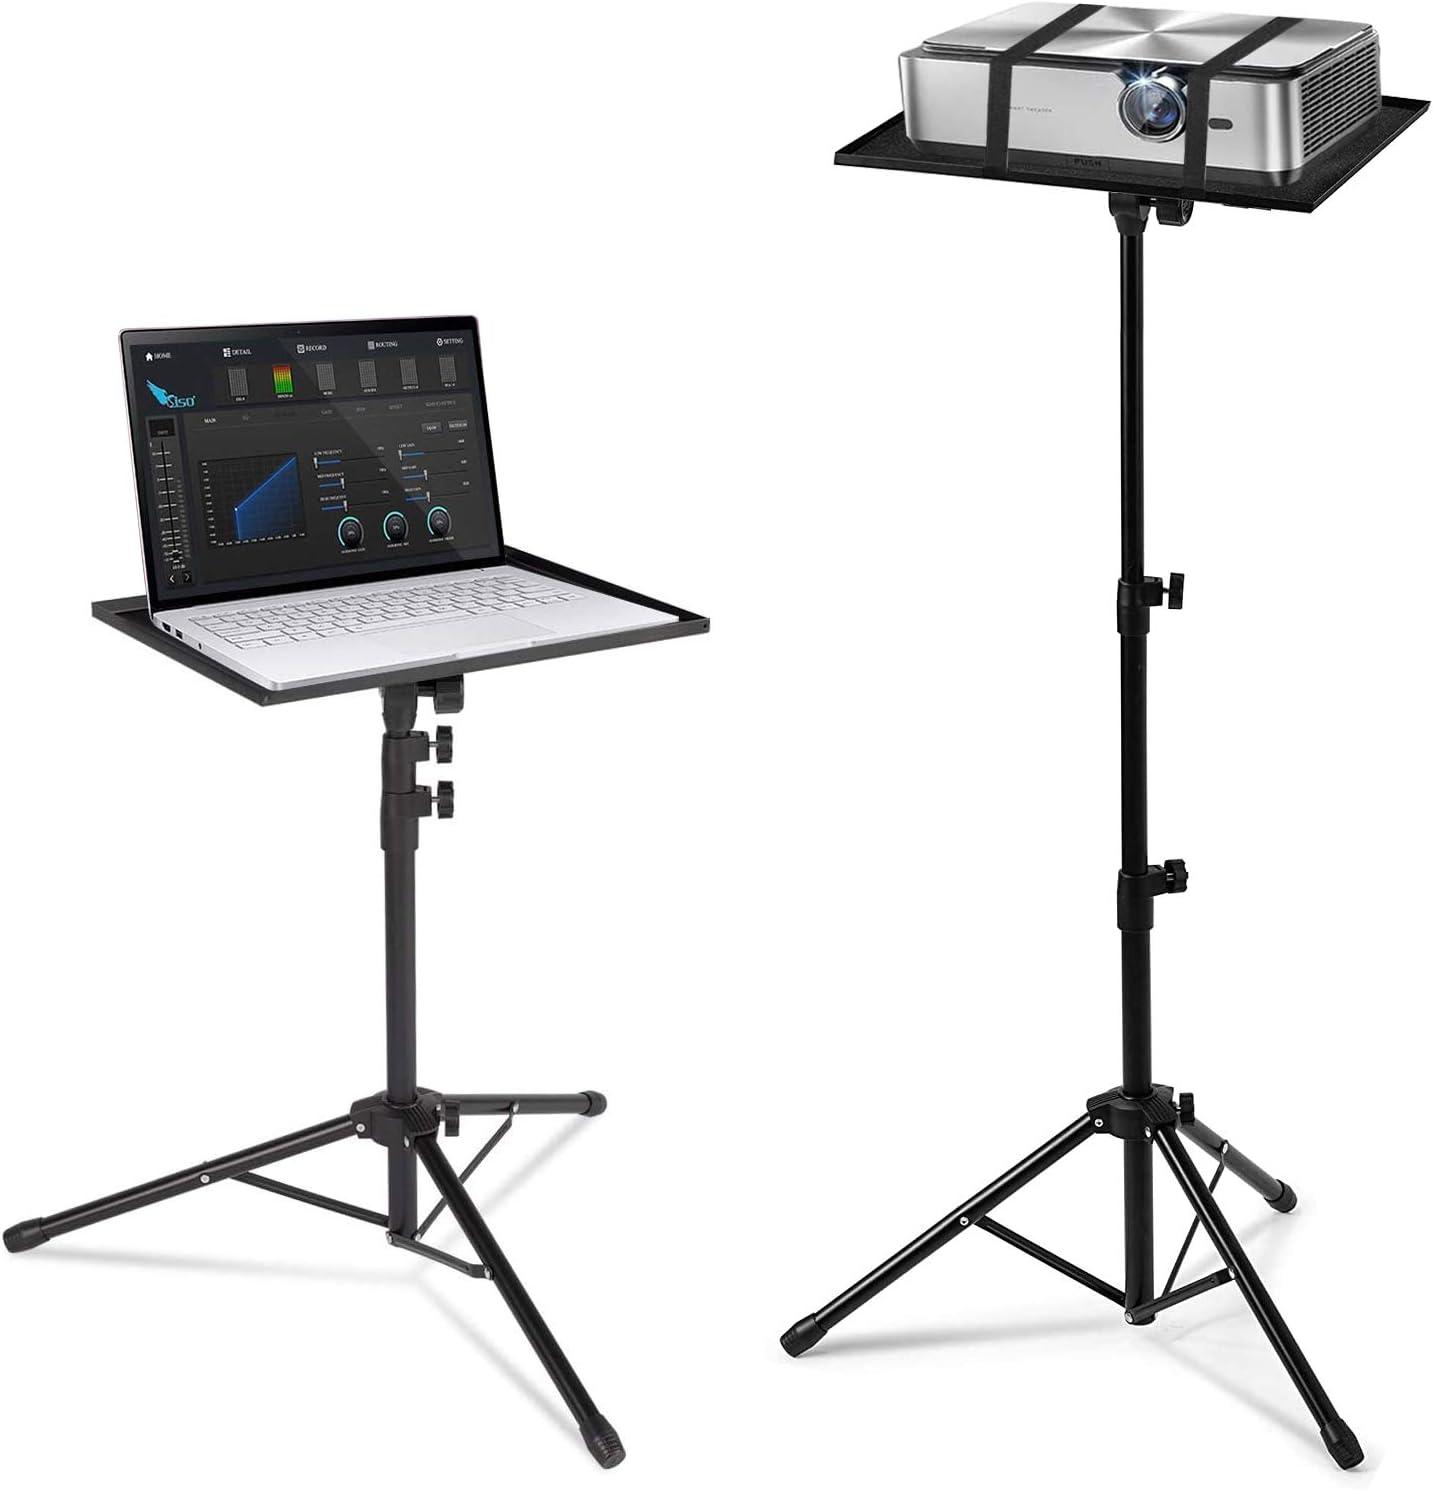 Wlretmci overseas Universal Excellence Laptop Projector Tripod Adjusta Stand Height